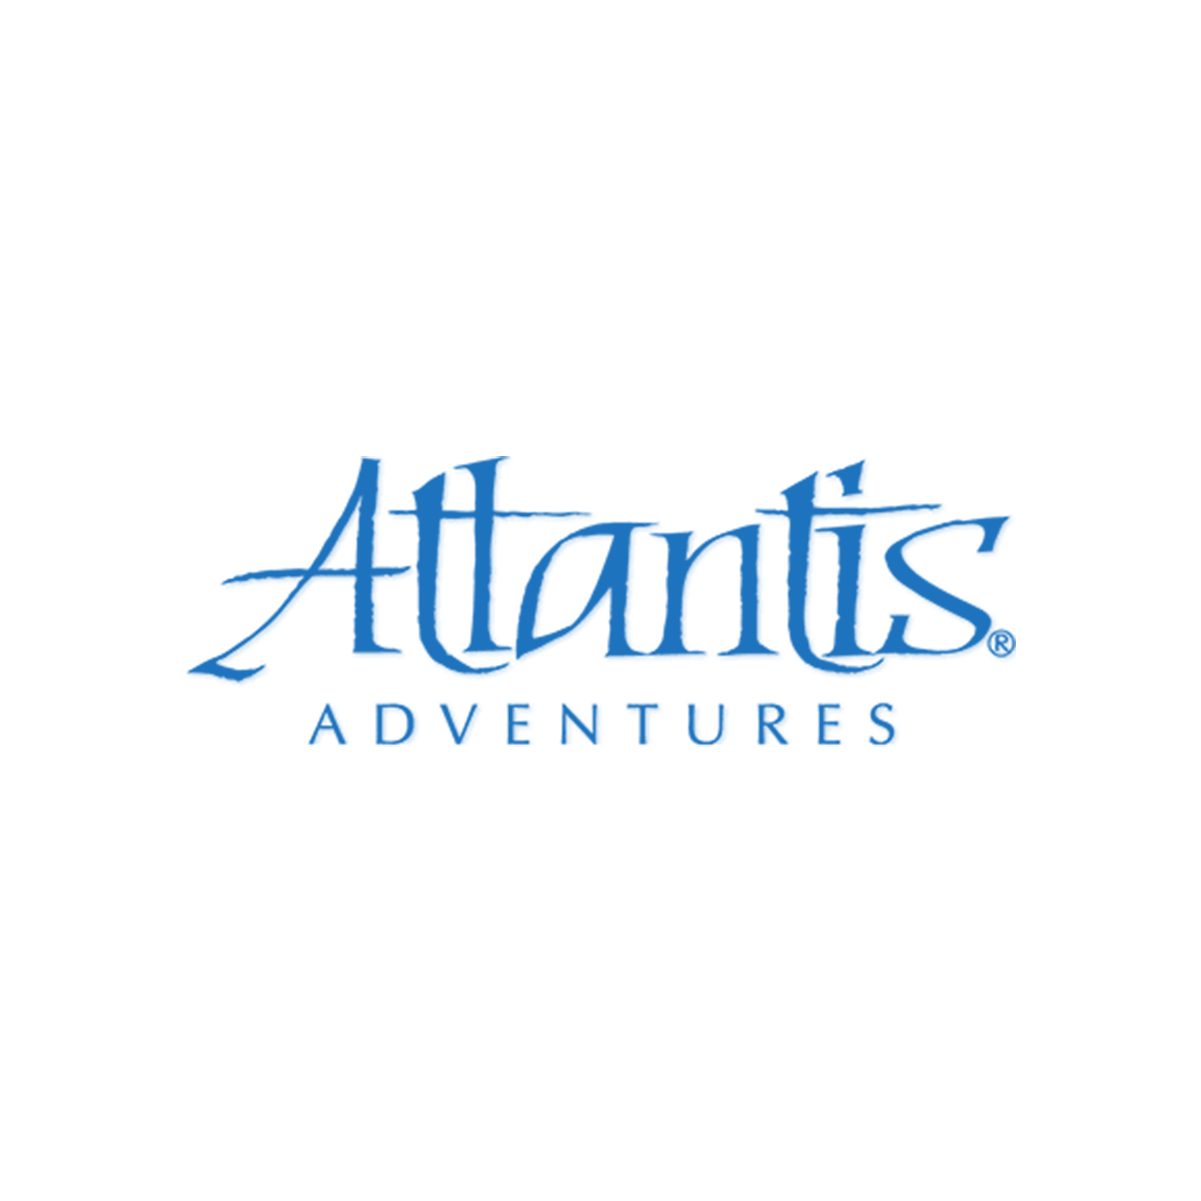 https://www.everydayvoip.com/wp-content/uploads/sites/3/2020/05/atlantis_logo.jpg